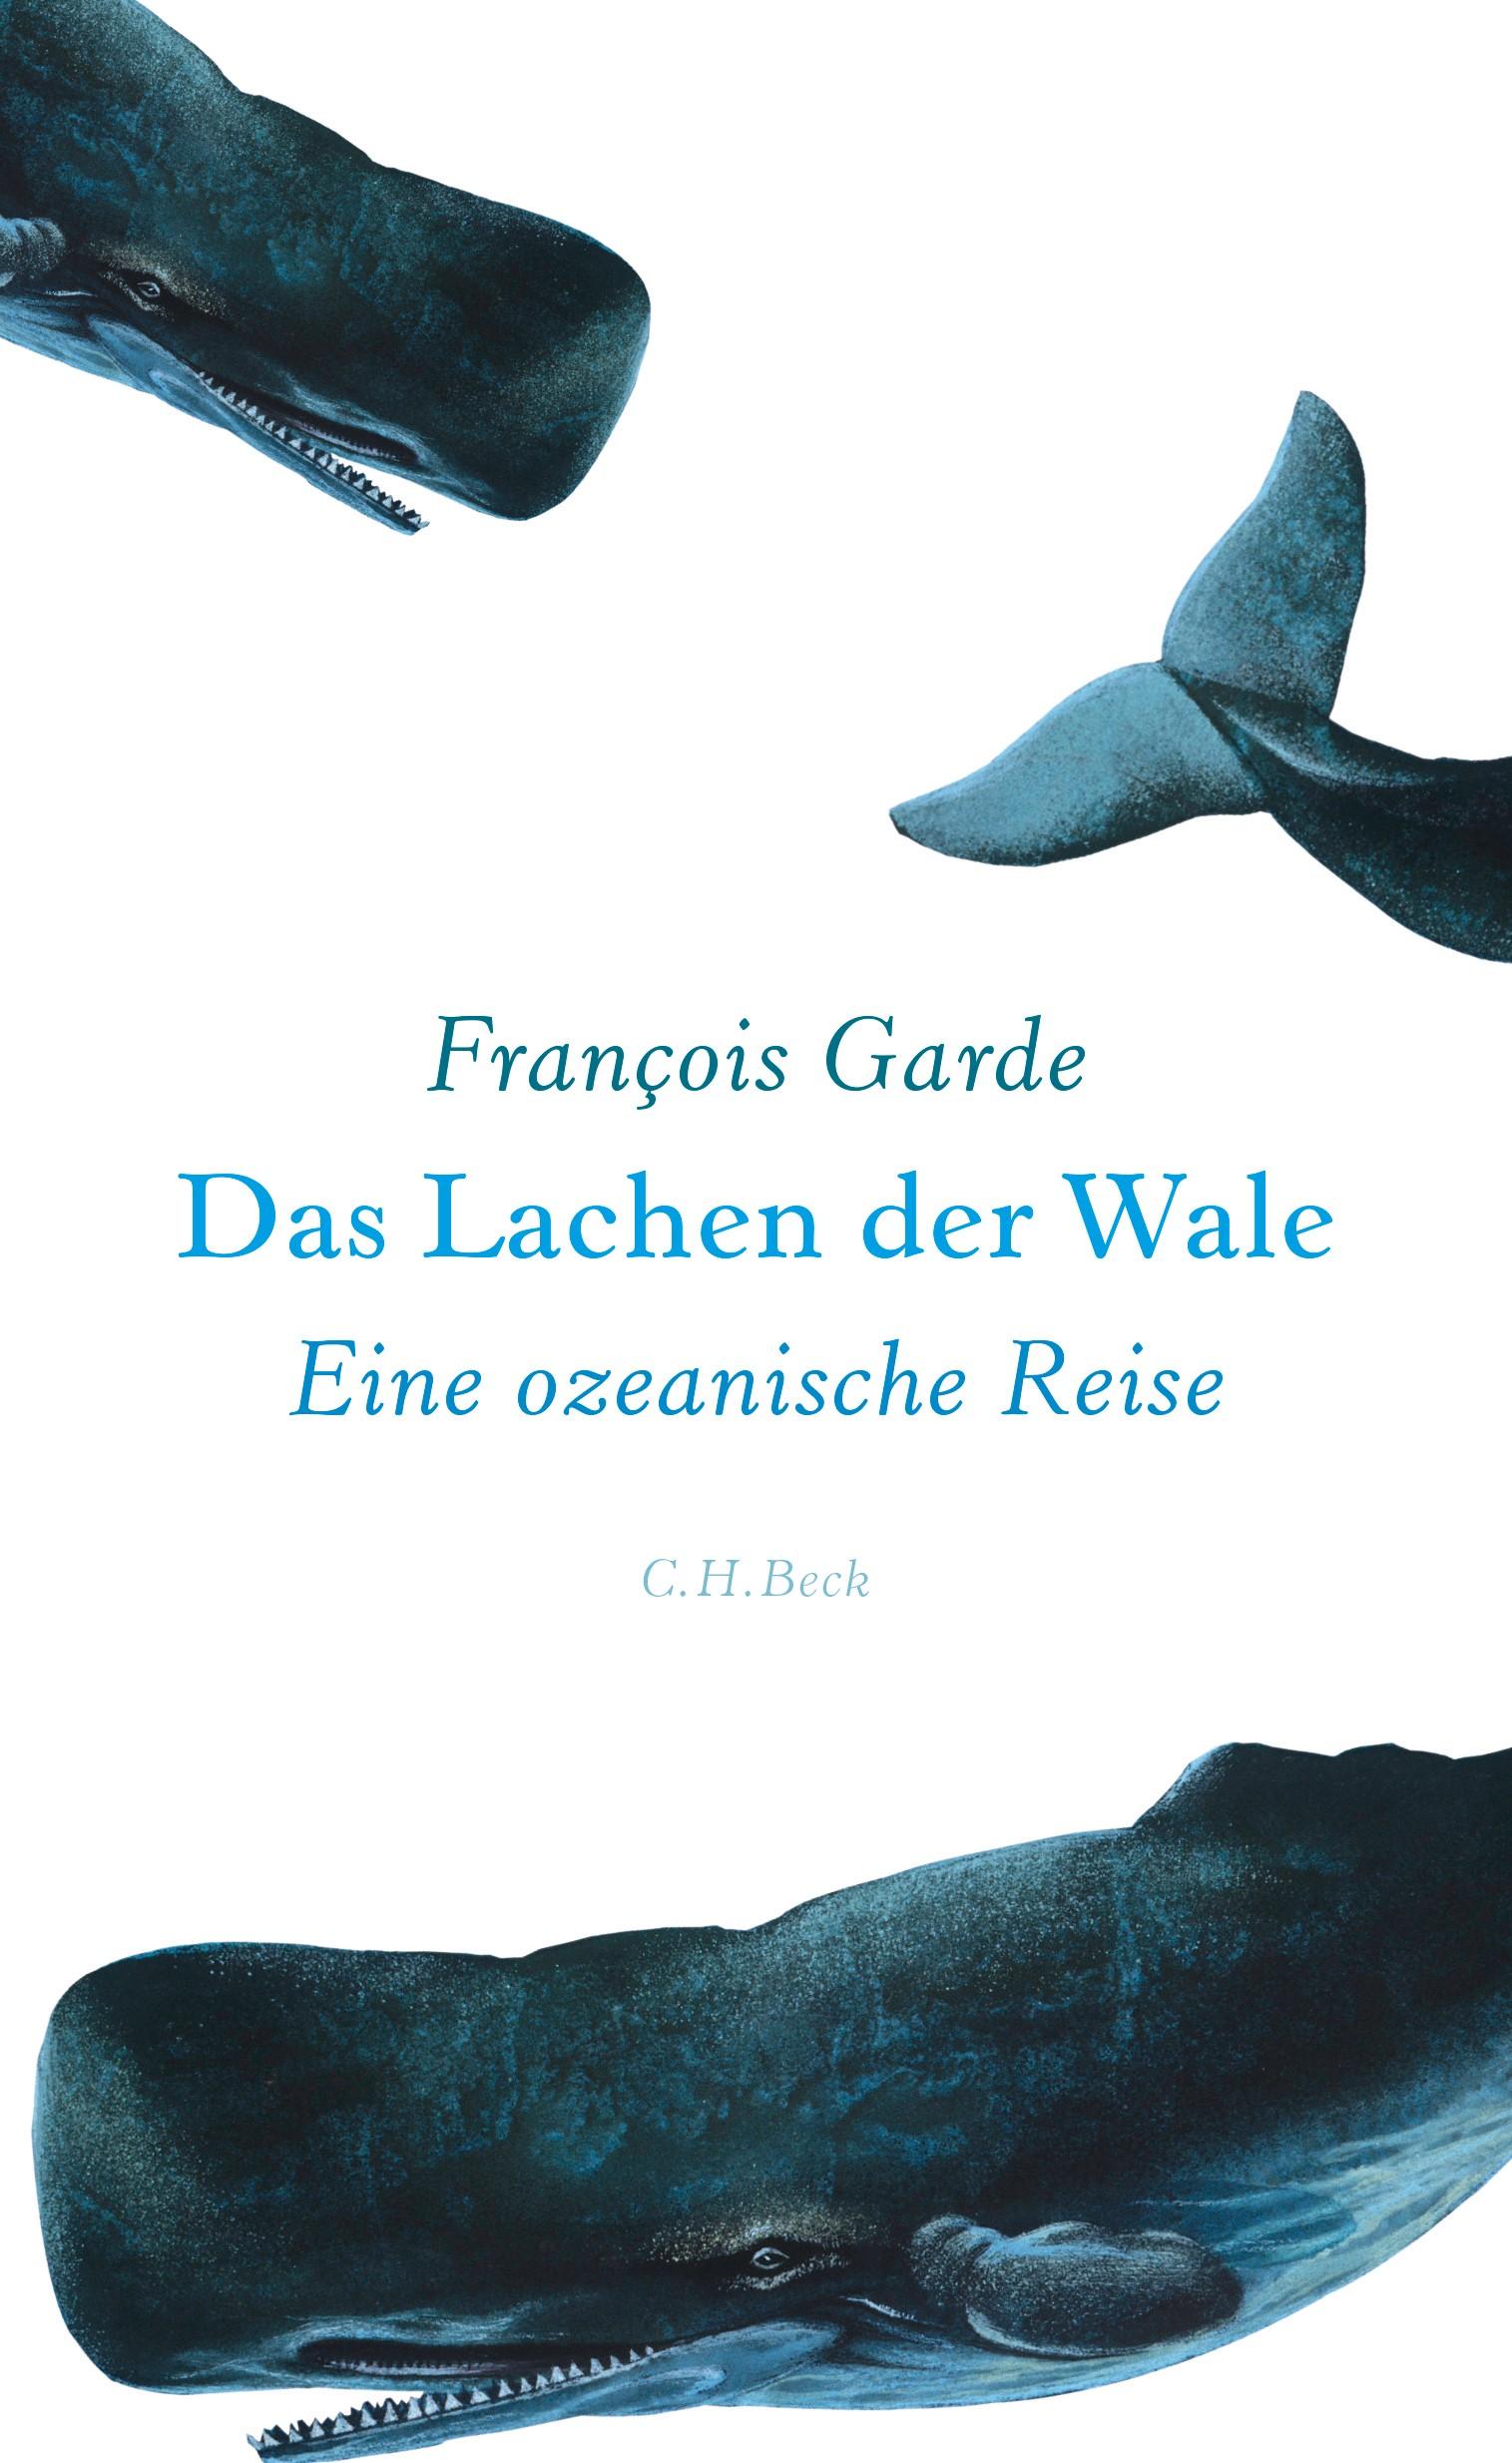 Cover des Buches 'Das Lachen der Wale'